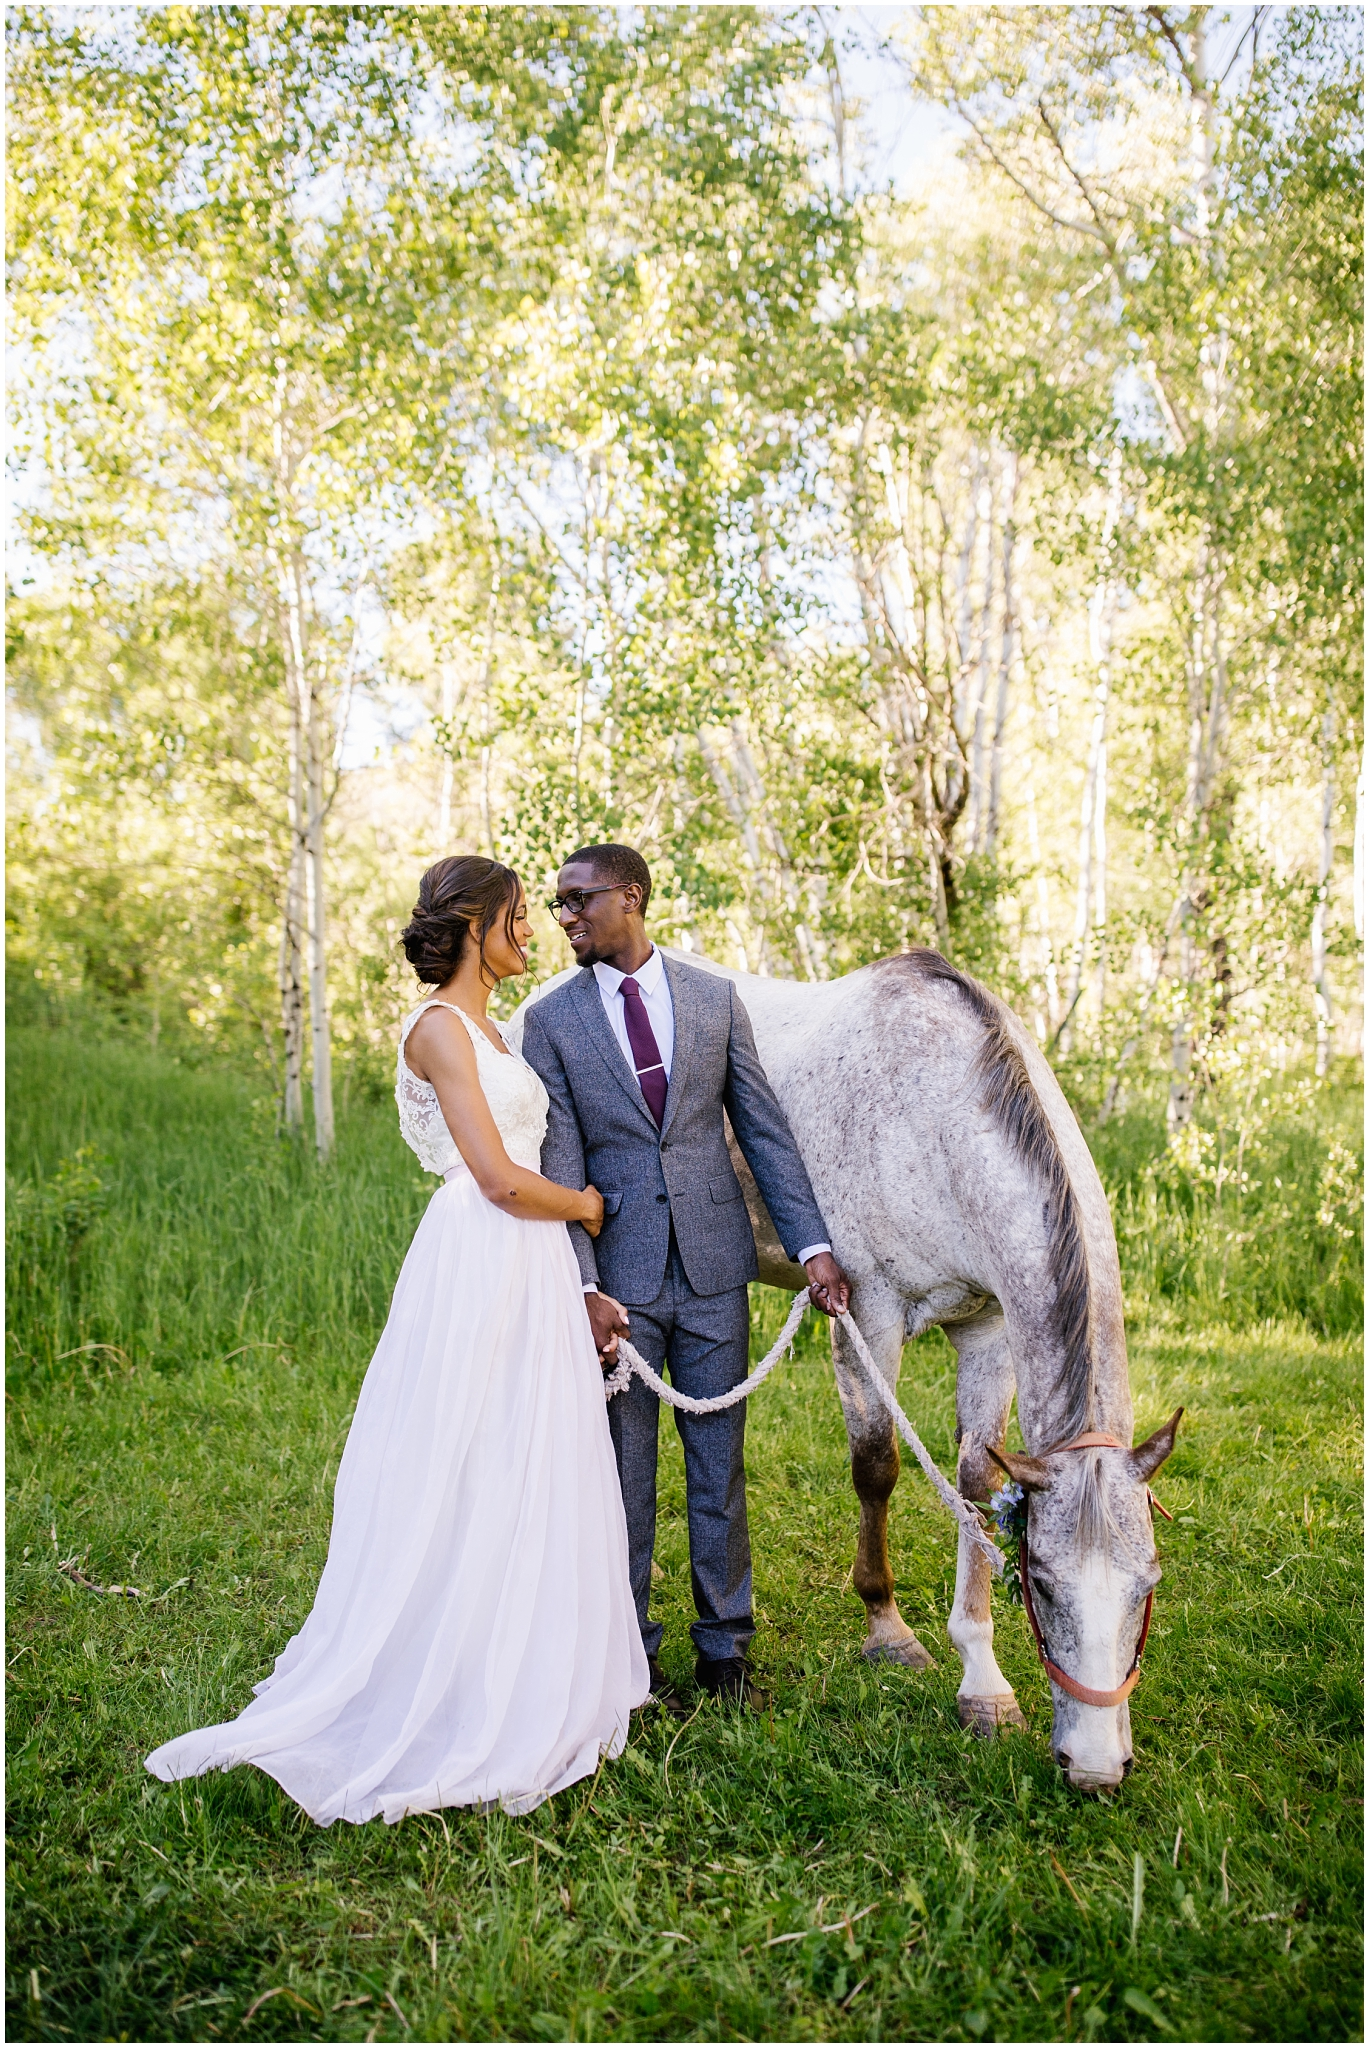 TreeHorseShoot-52_Lizzie-B-Imagery-Utah-Wedding-Photographer-Salt-Lake-City-Park-City-Oakley.jpg